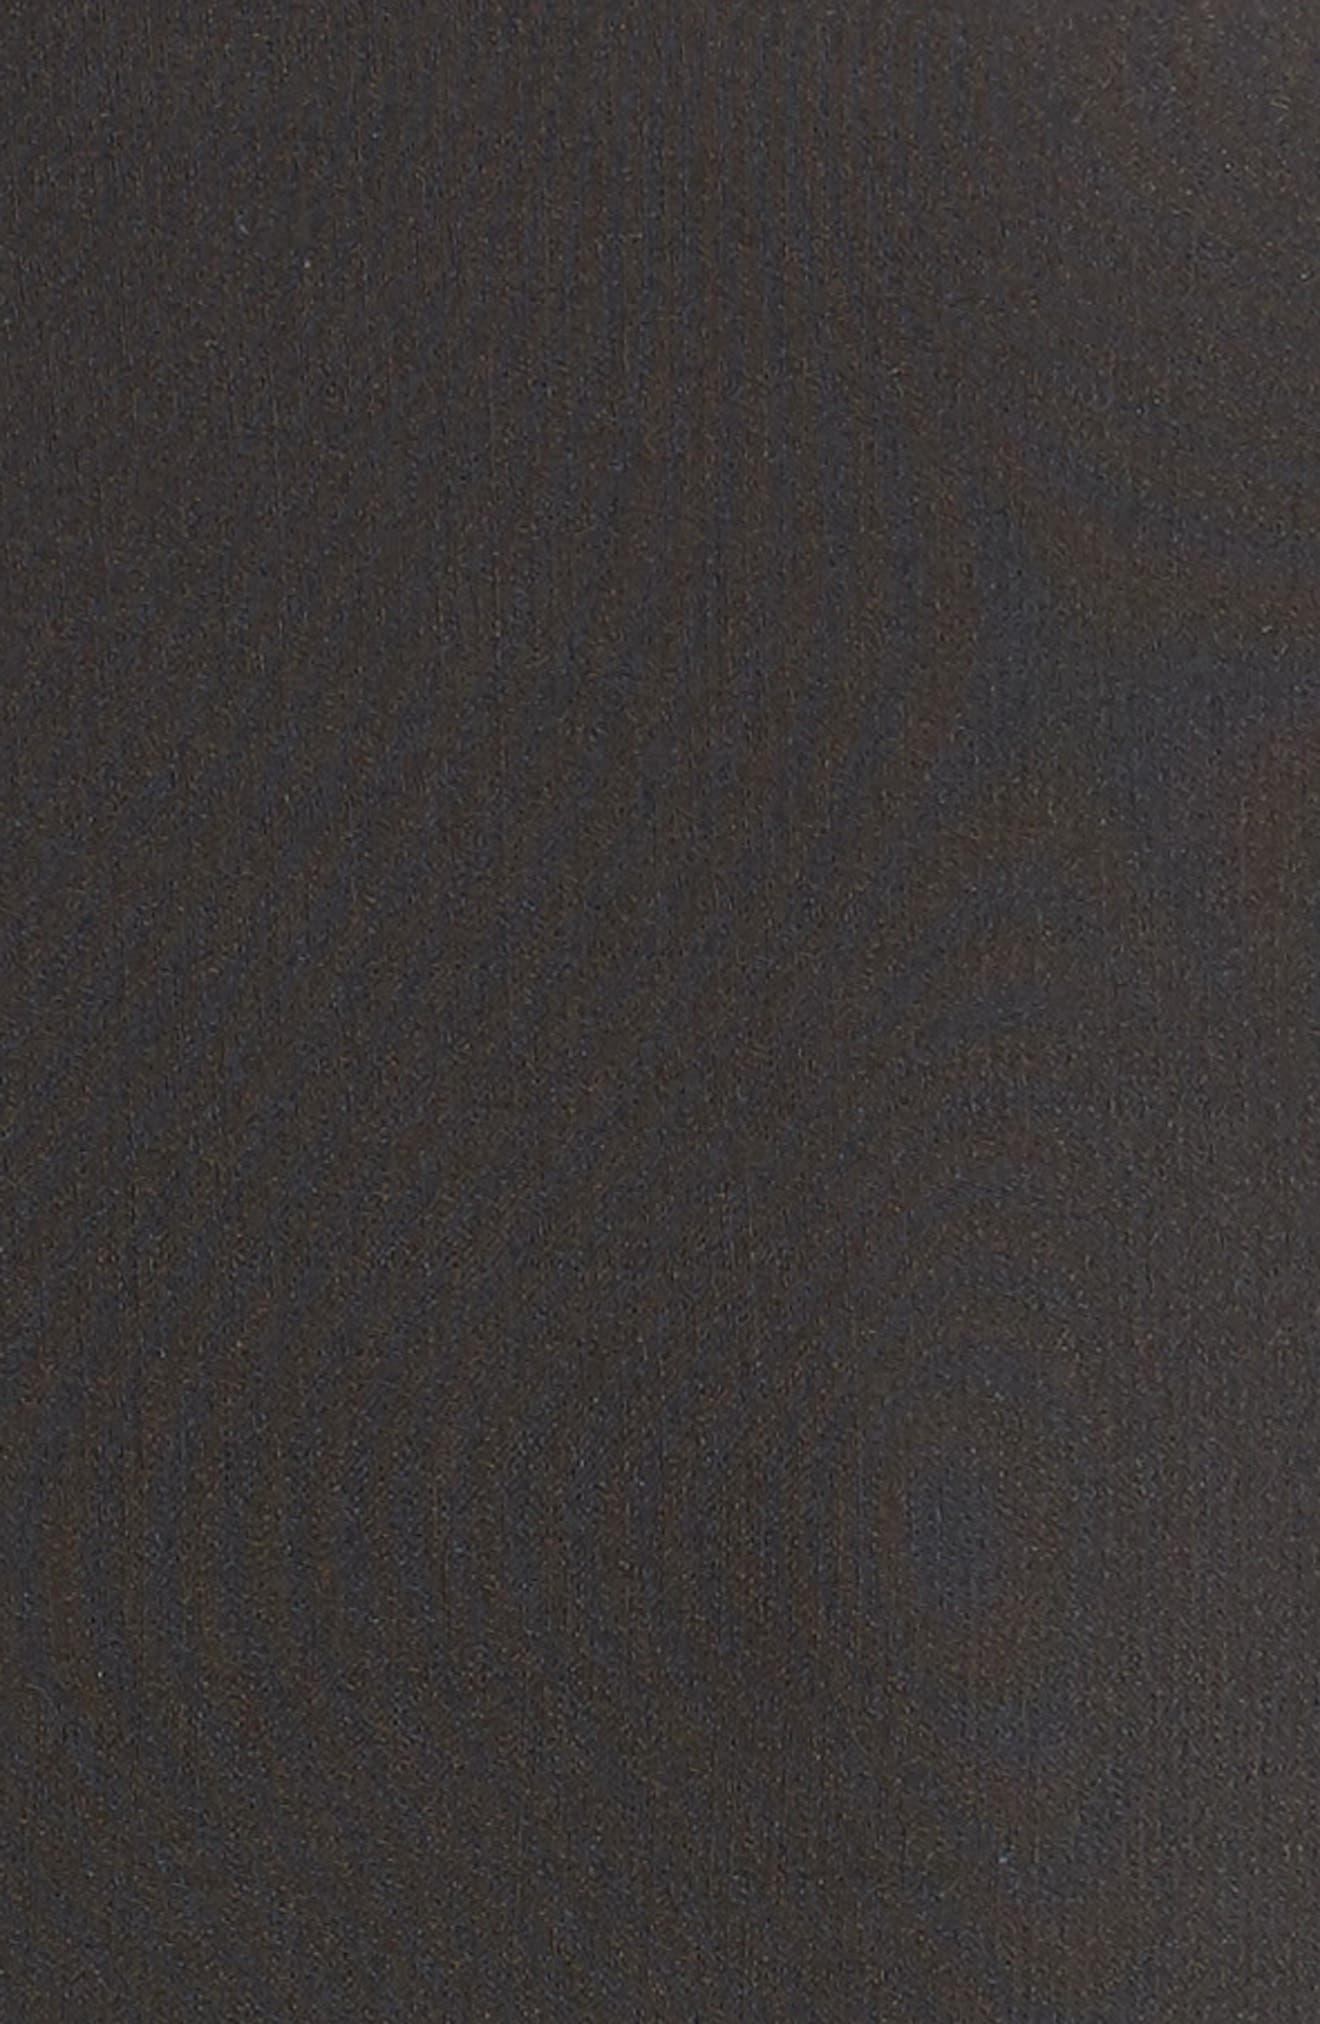 Alternate Image 3  - Michael Kors Stretch Pebble Crepe Bolero Sheath Dress